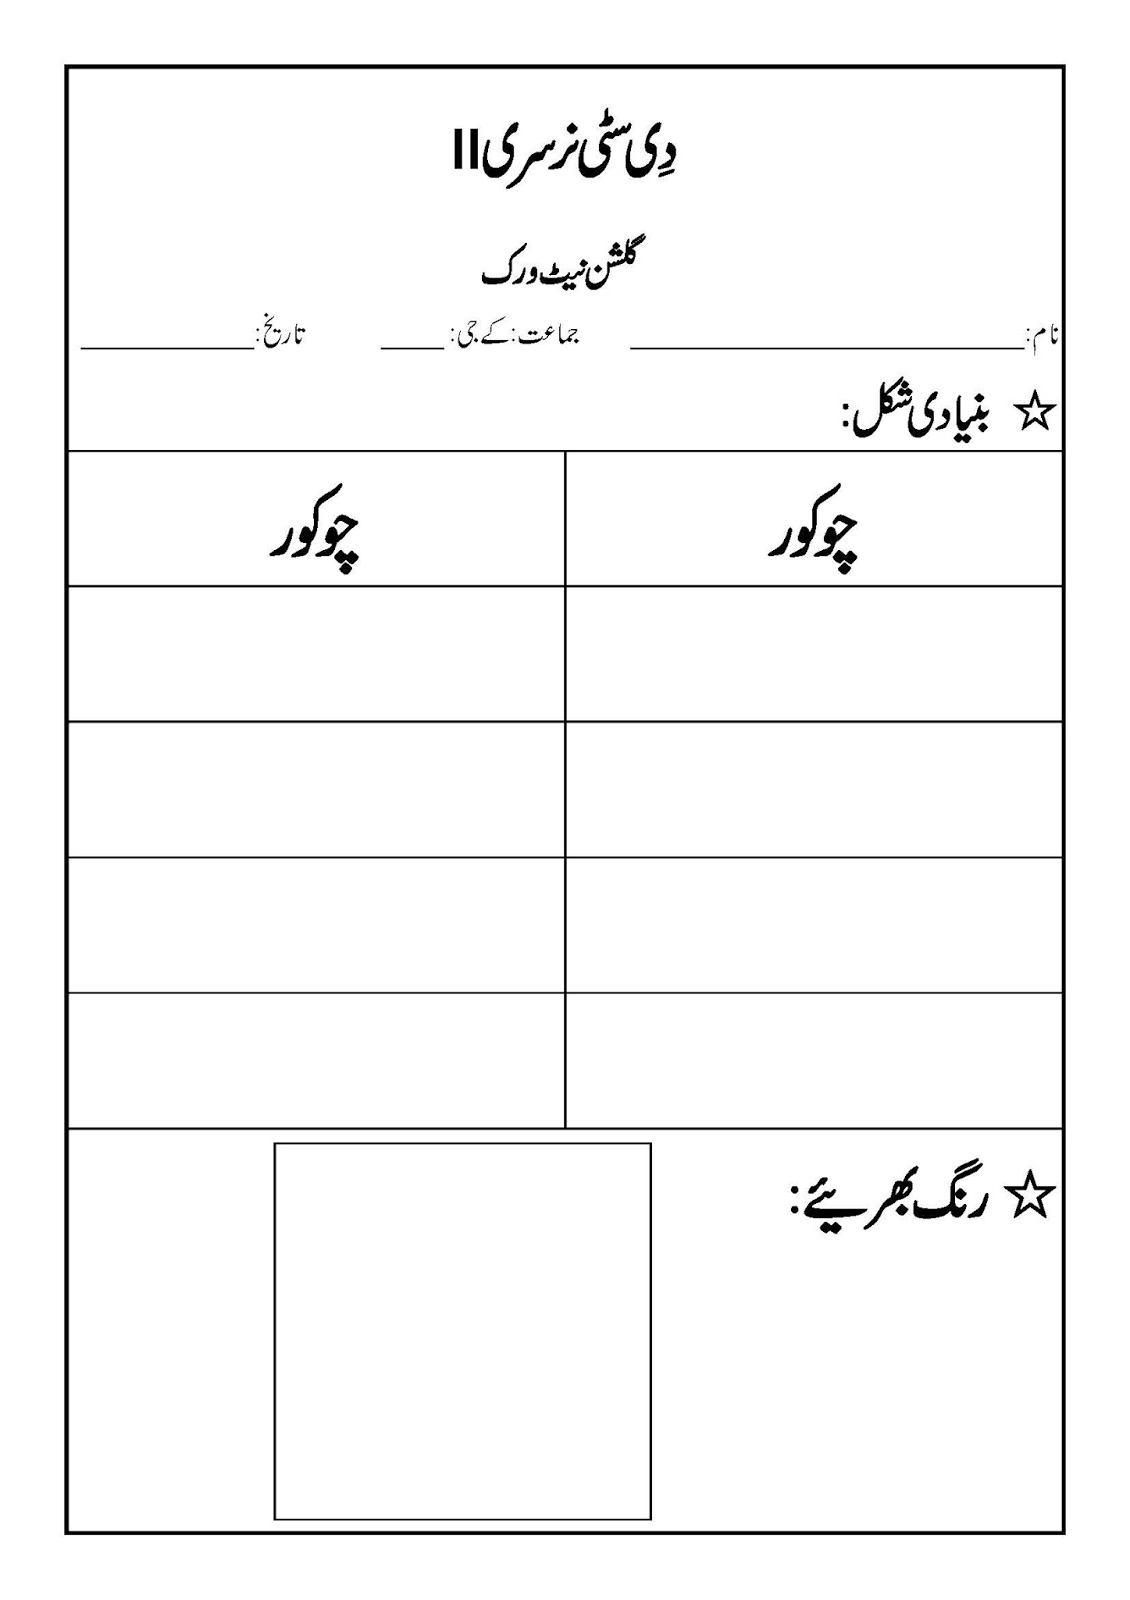 Sr Gulshan The City Nursery Ii Urdu English Math Worksheets